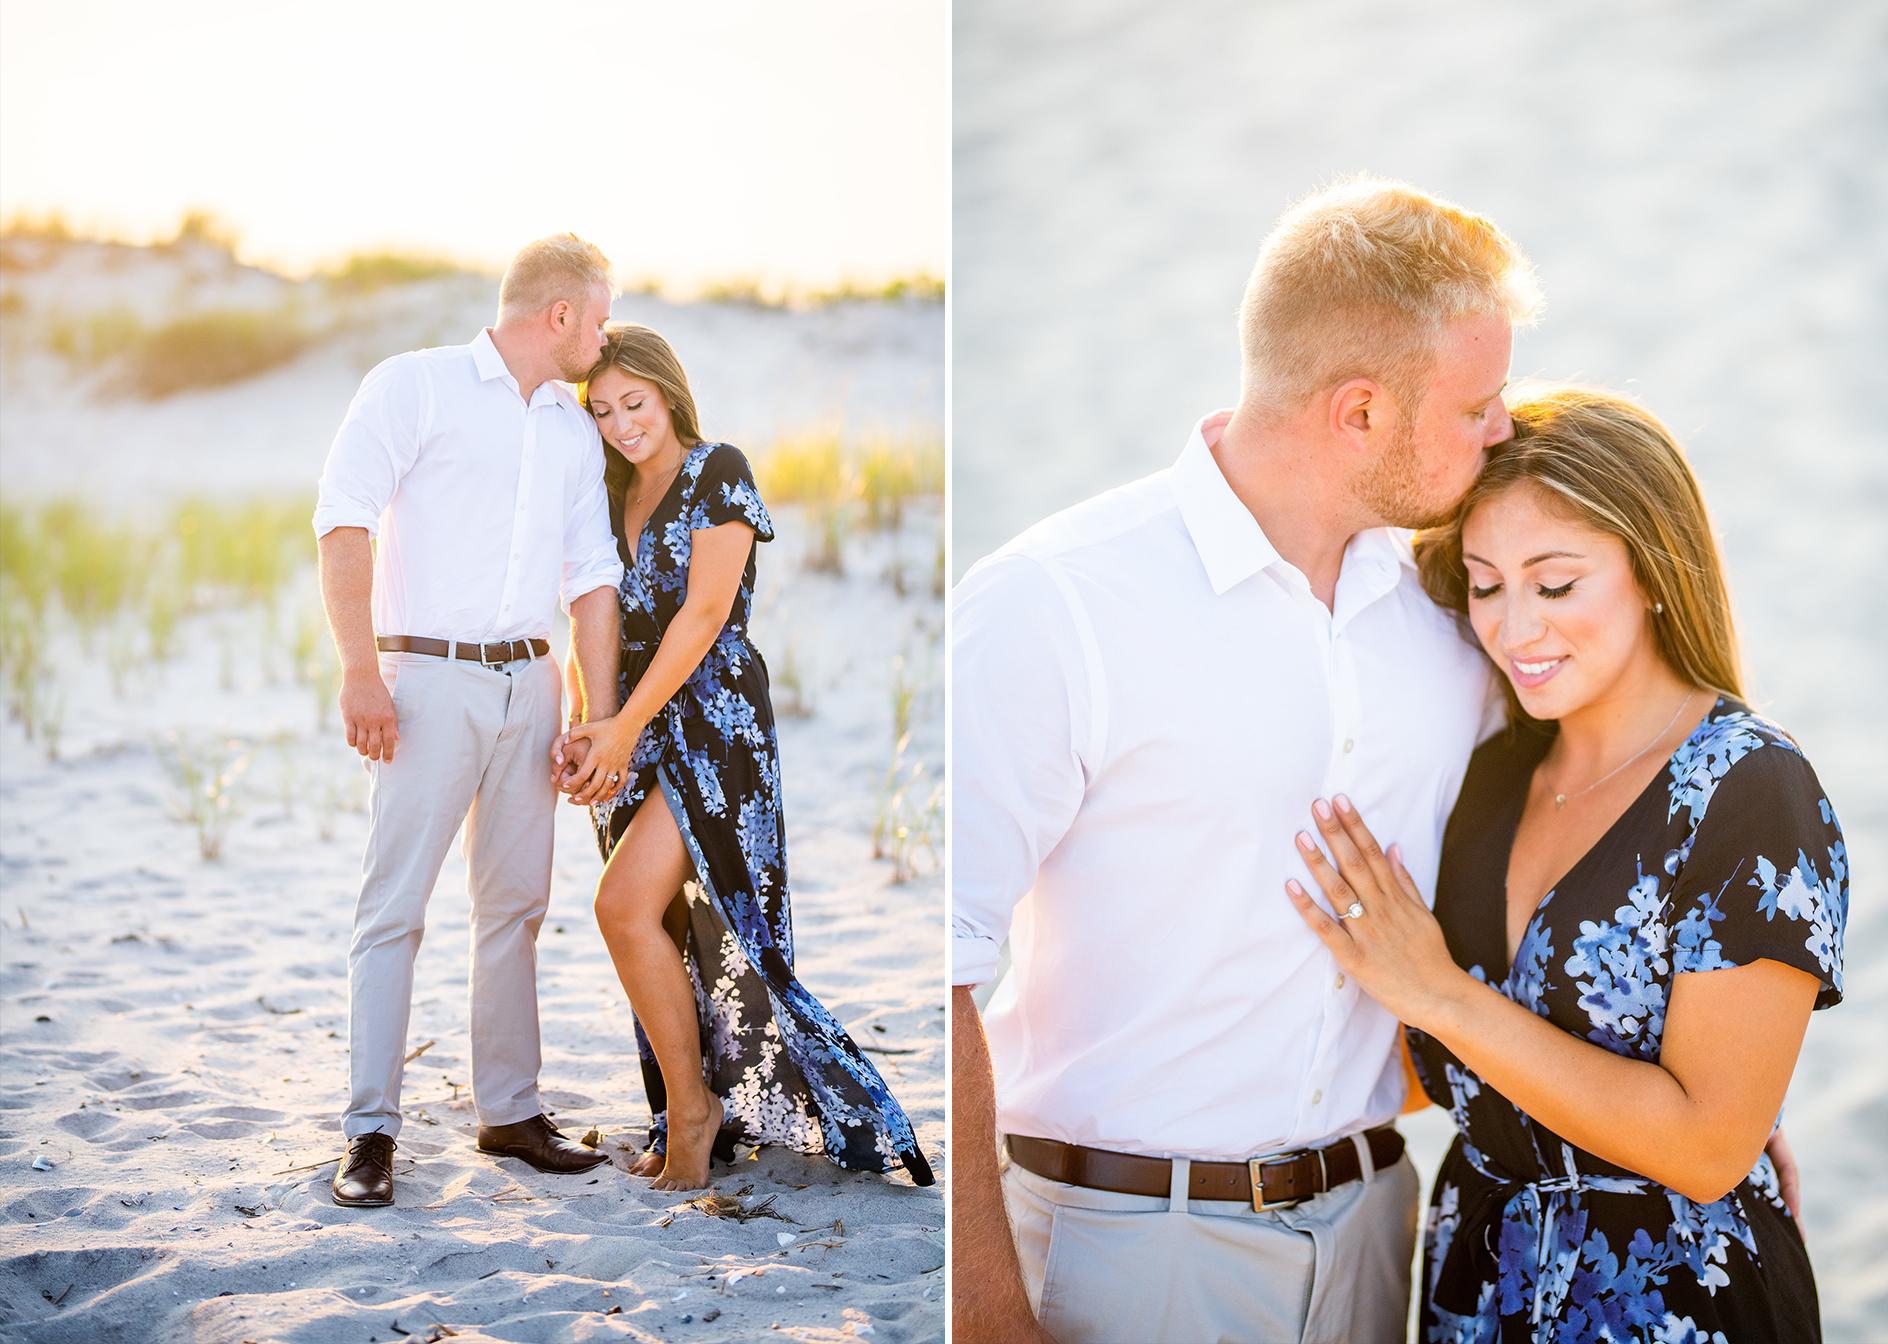 Dune Road Engagement Shoot | Westhampton Beach Engagement Shoot | Hamptons Wedding Photographer6